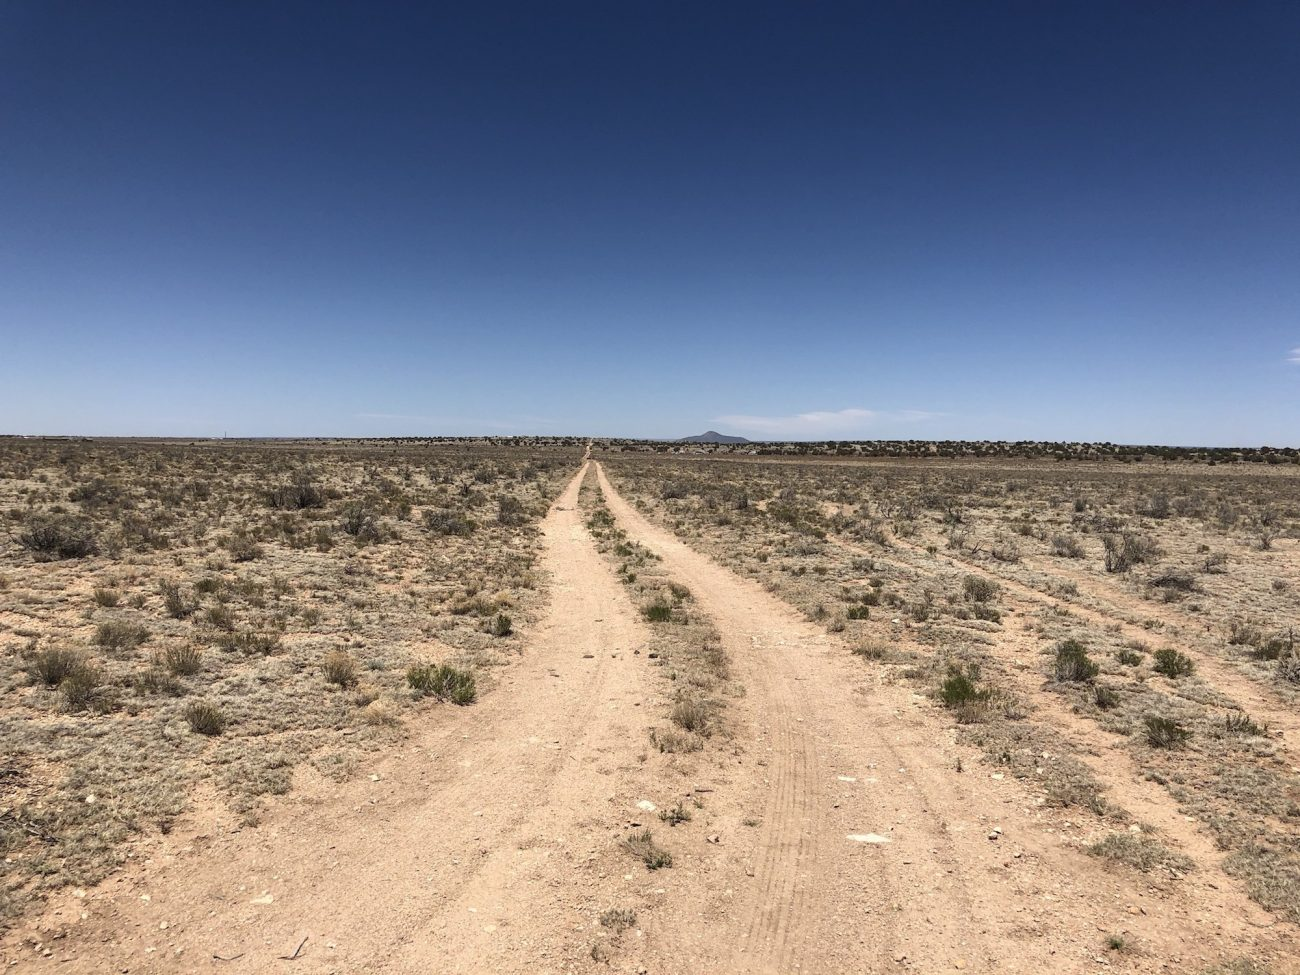 scouting land in williams, az